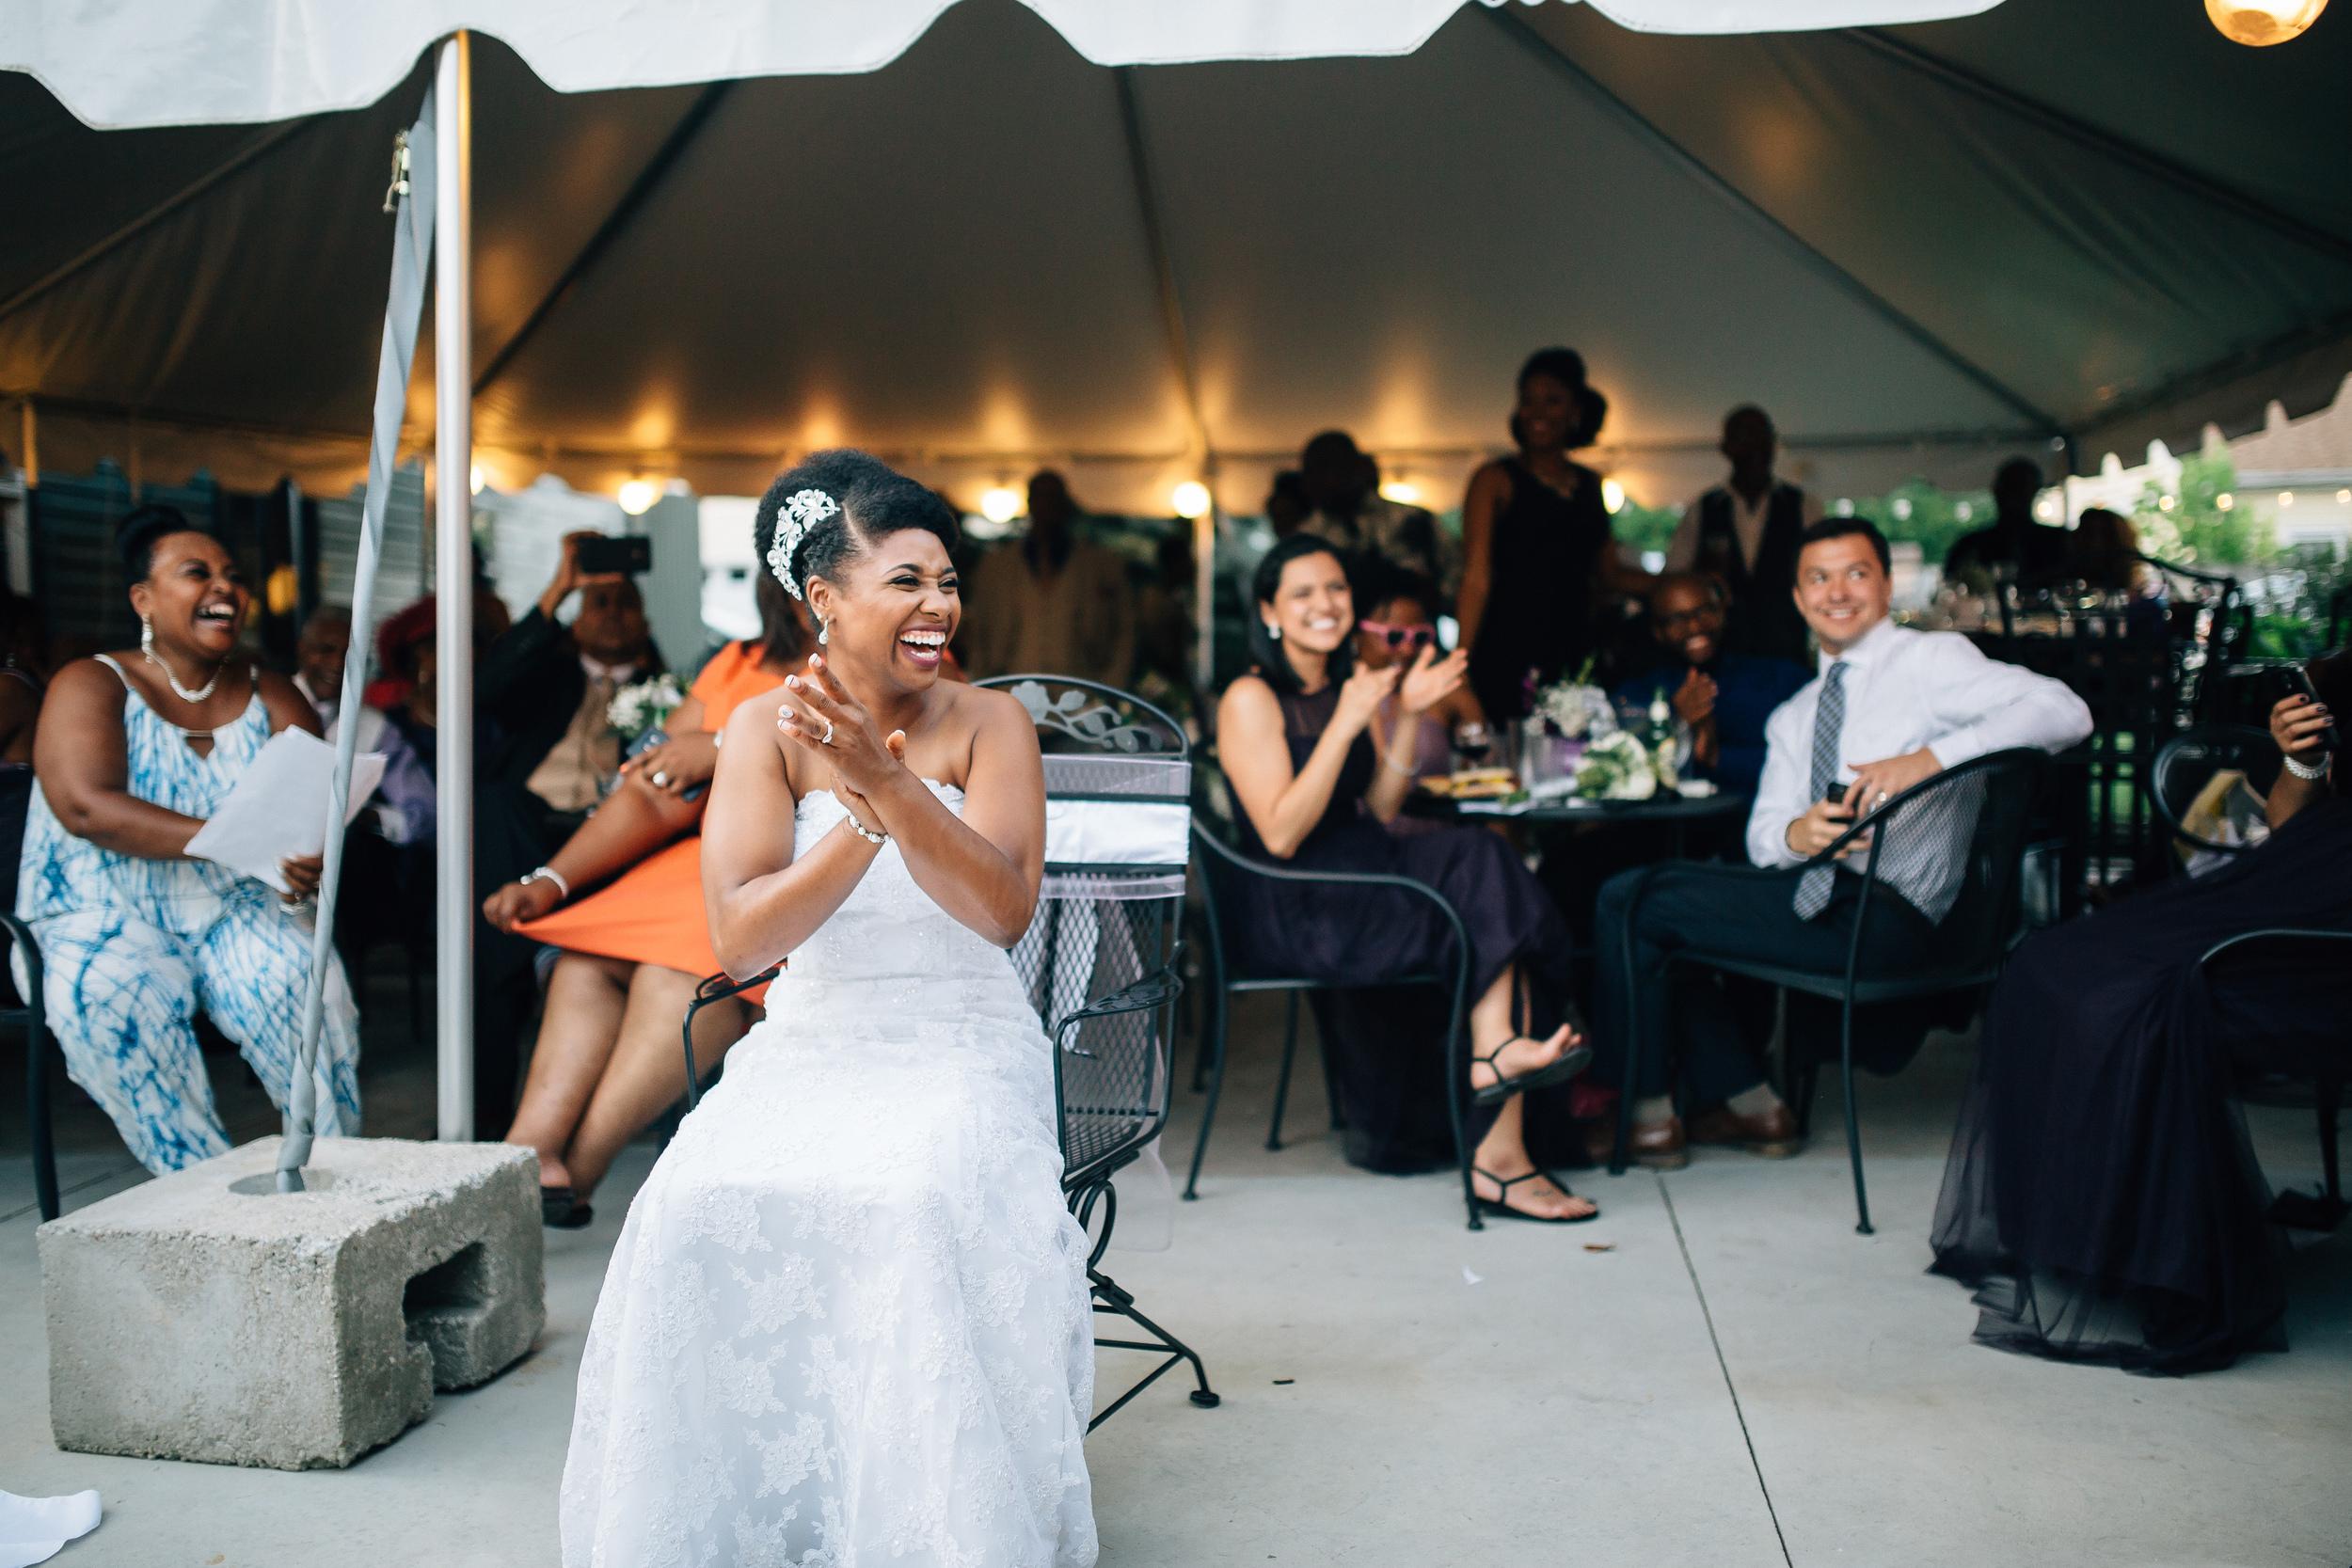 Chuck & Alicia's Wedding - Corrie Mick Photography-625.jpg